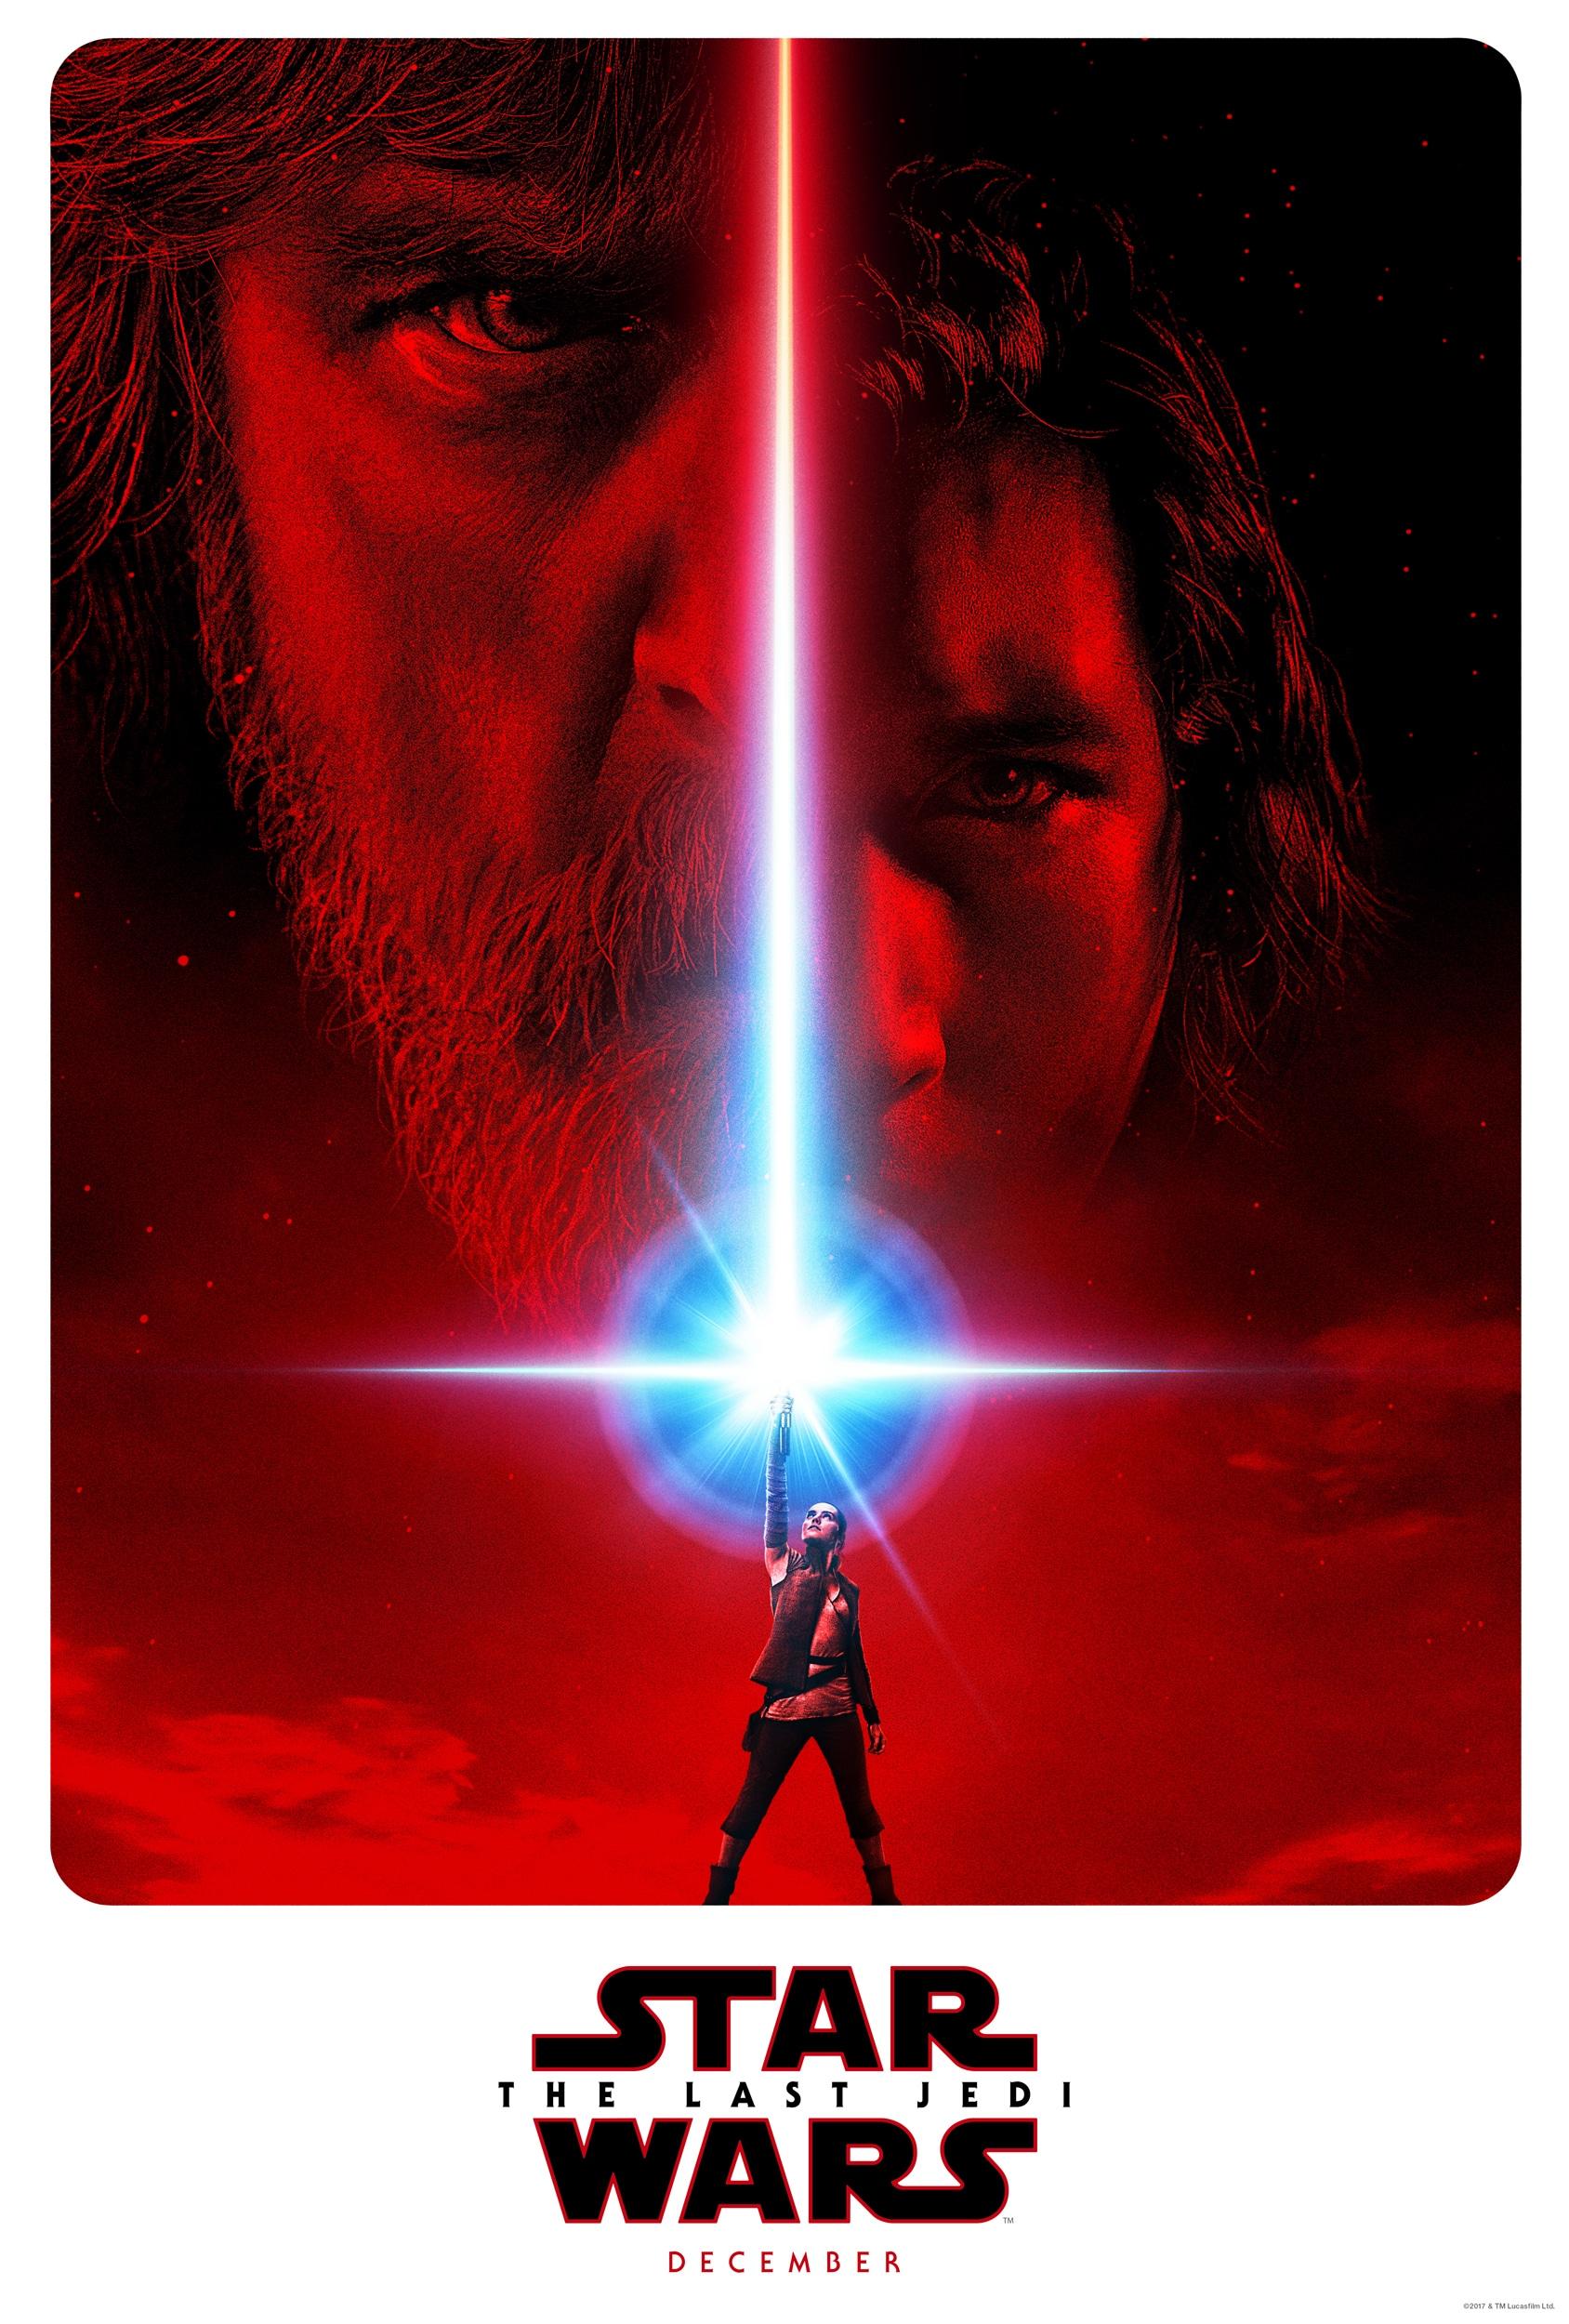 #TheLastJedi Star Wars